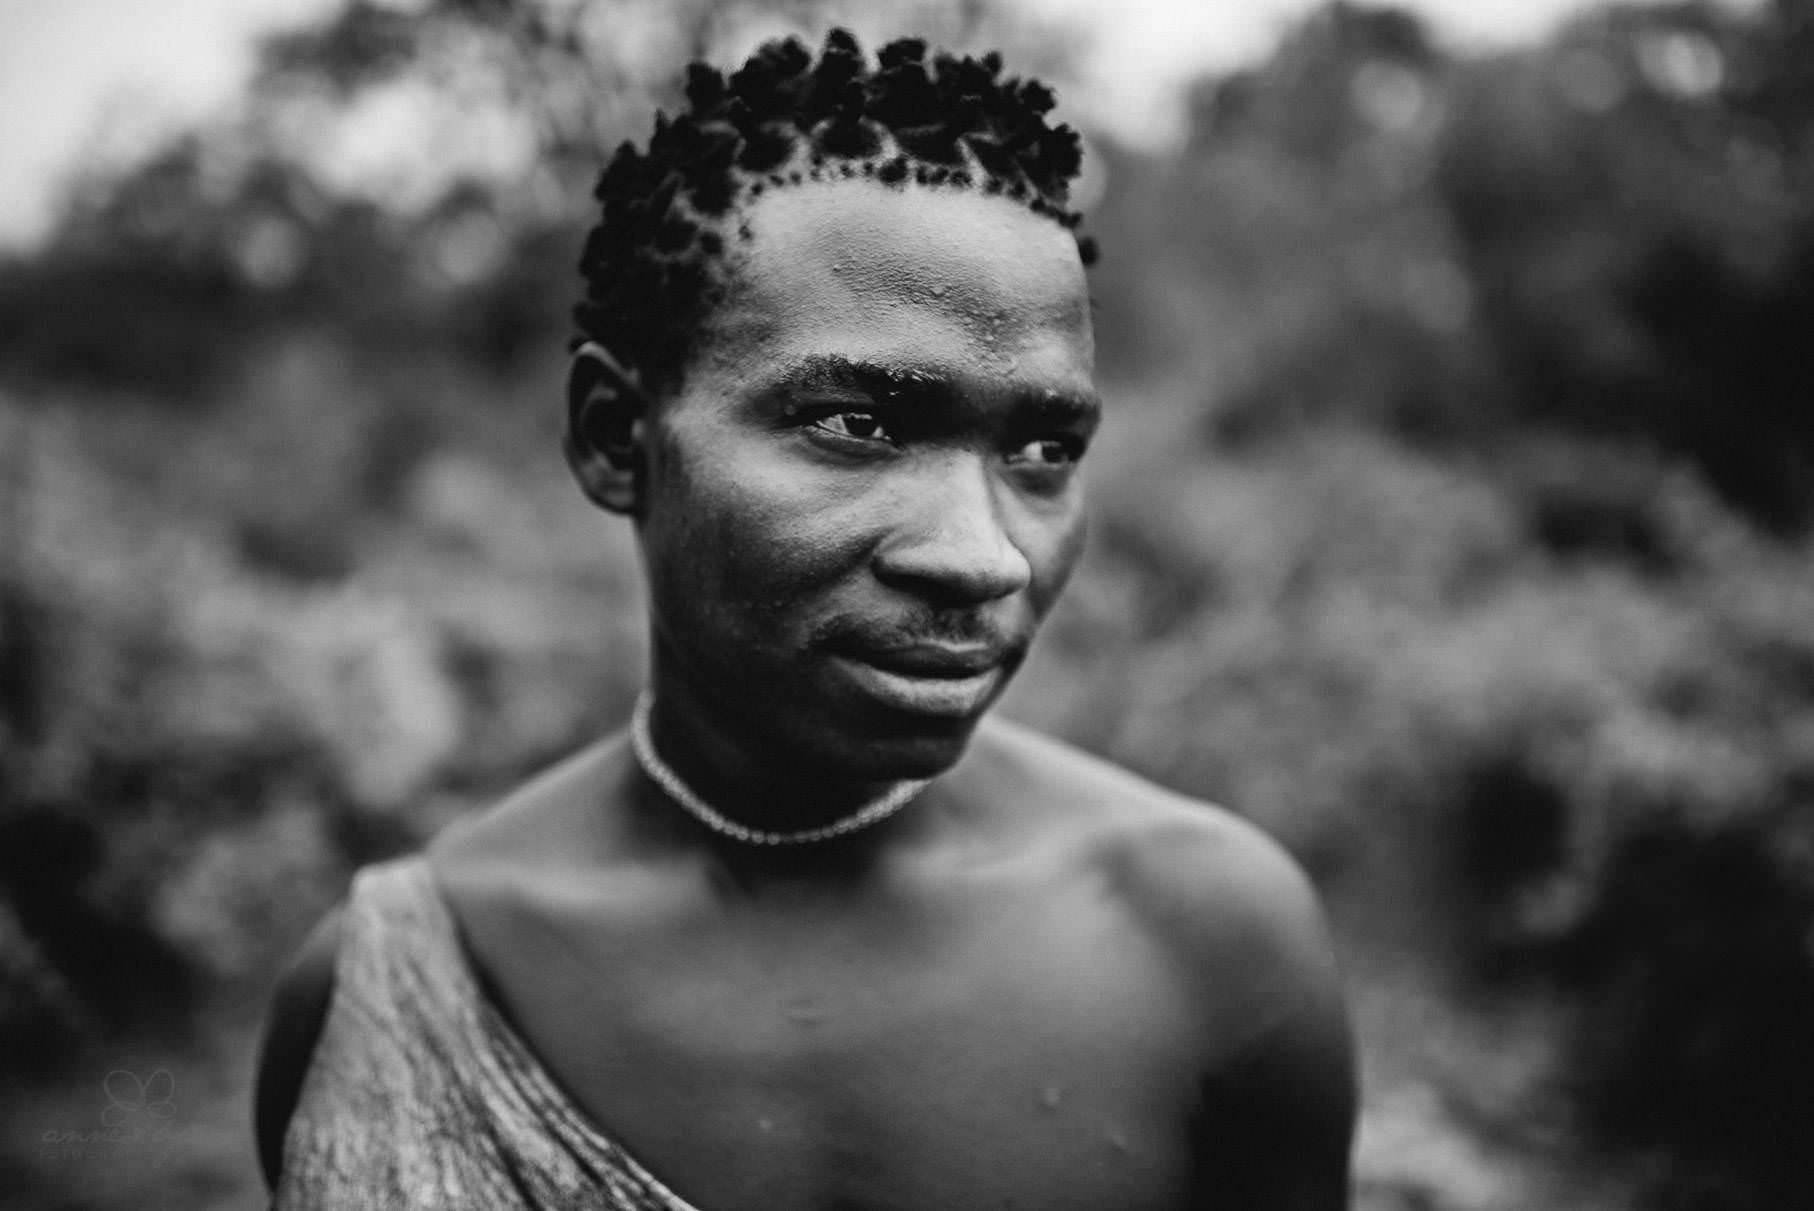 0065 tansania nd8 1941 anne bjoern fotografie hochzeitsfotograf hamburg - This is Tanzania - Serengeti, Kilimanjaro & Sansibar